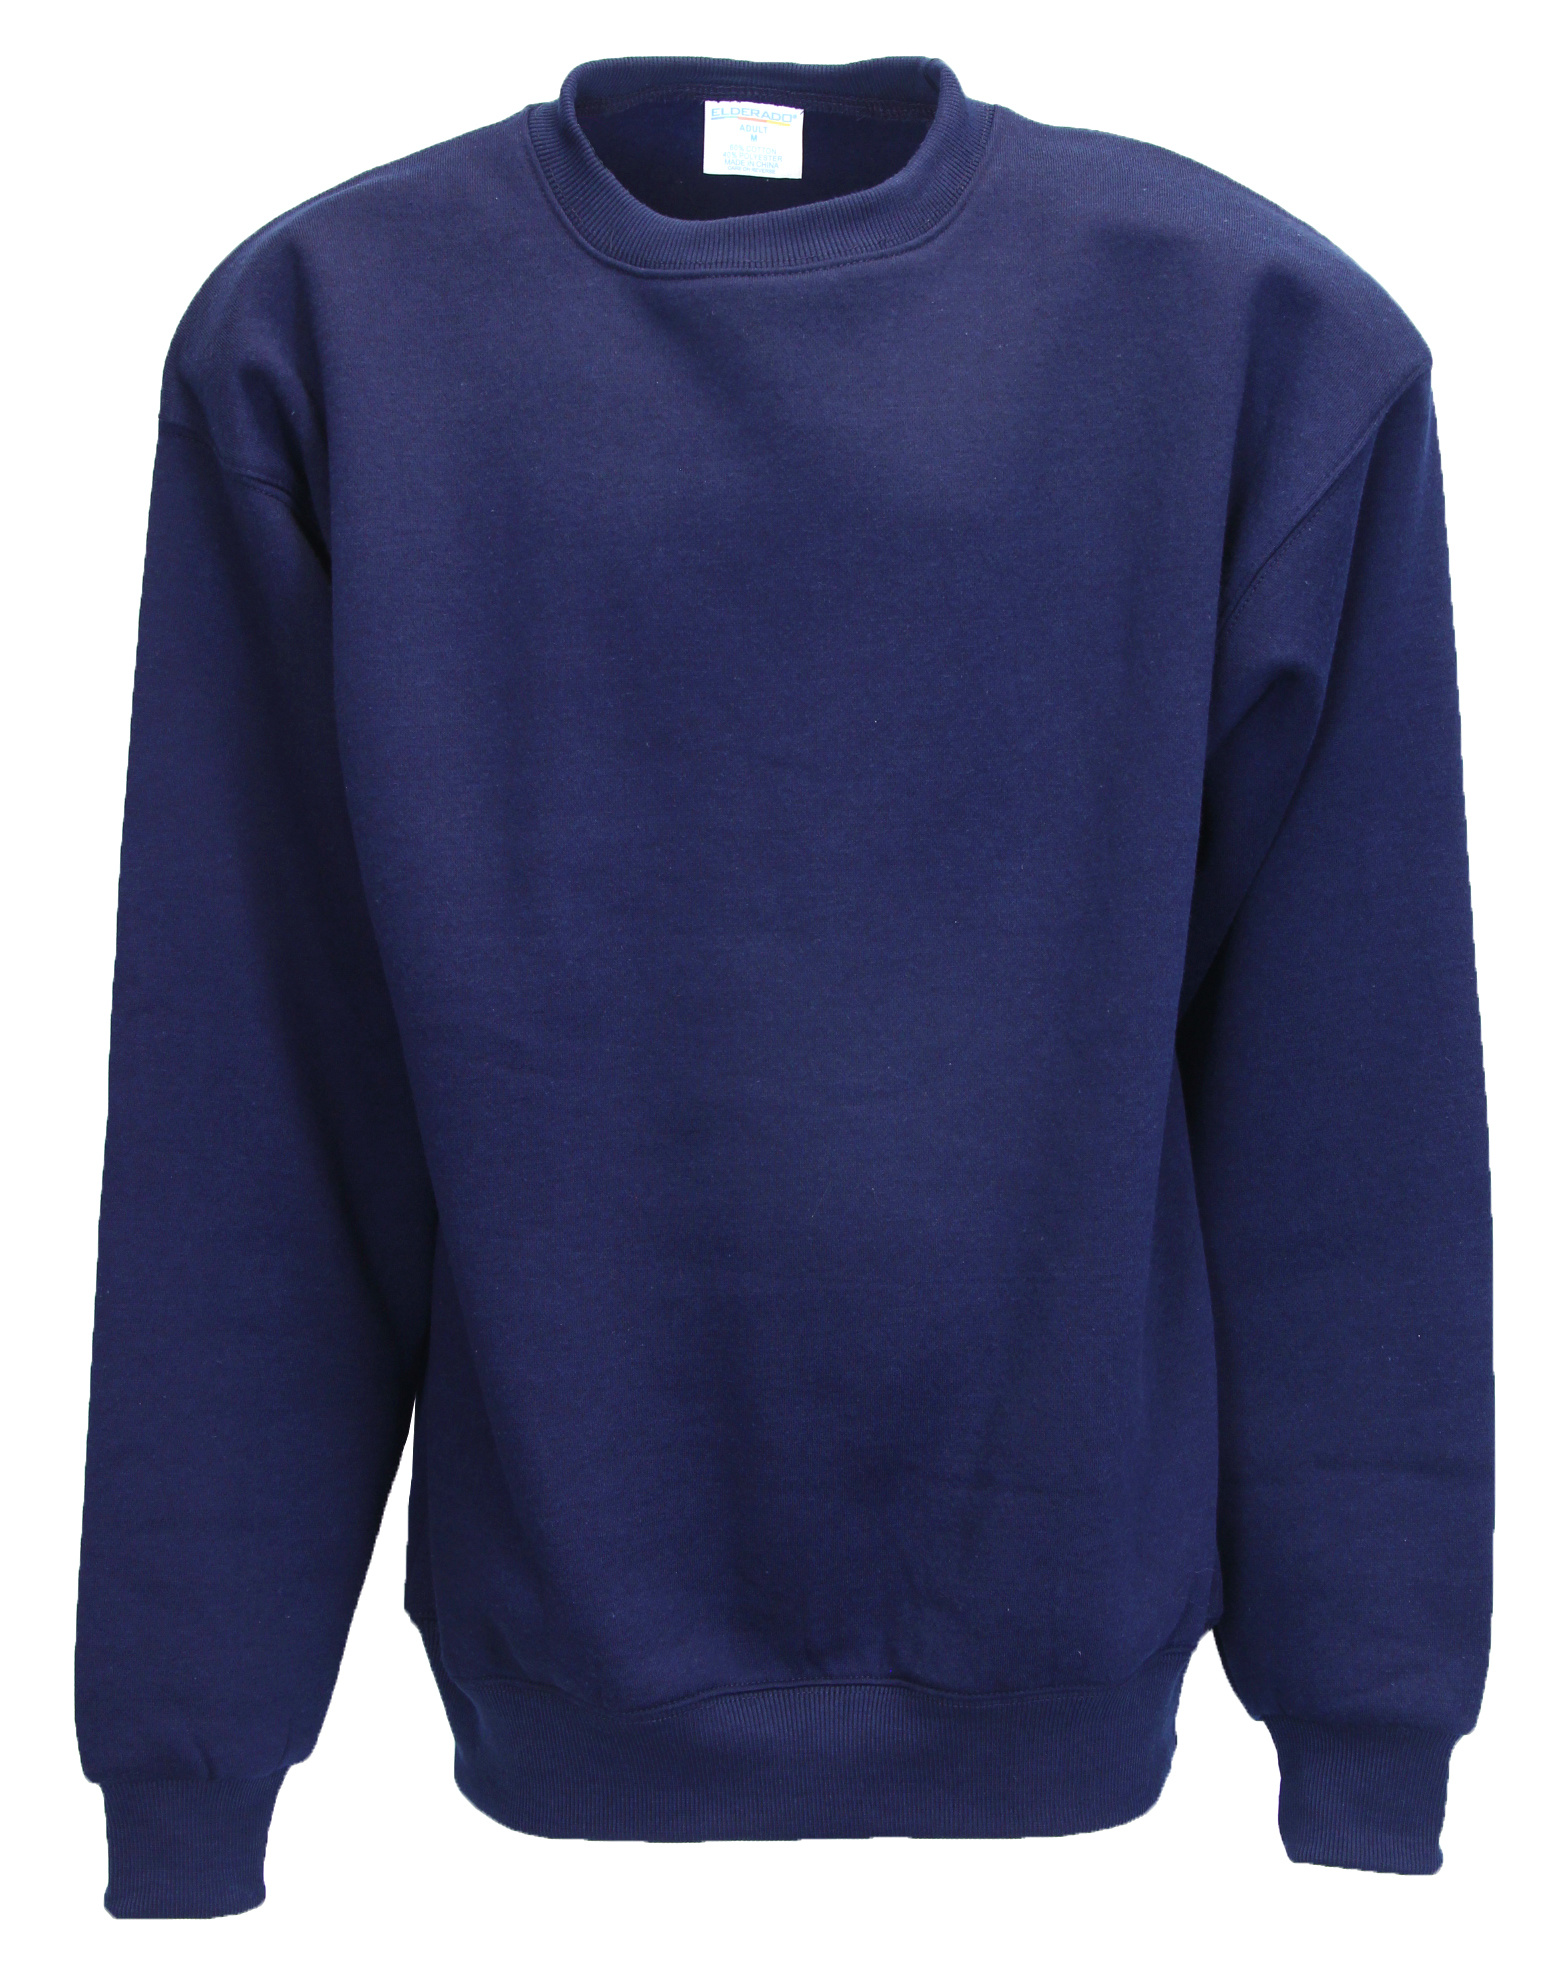 Holy Family Crew Sweatshirt